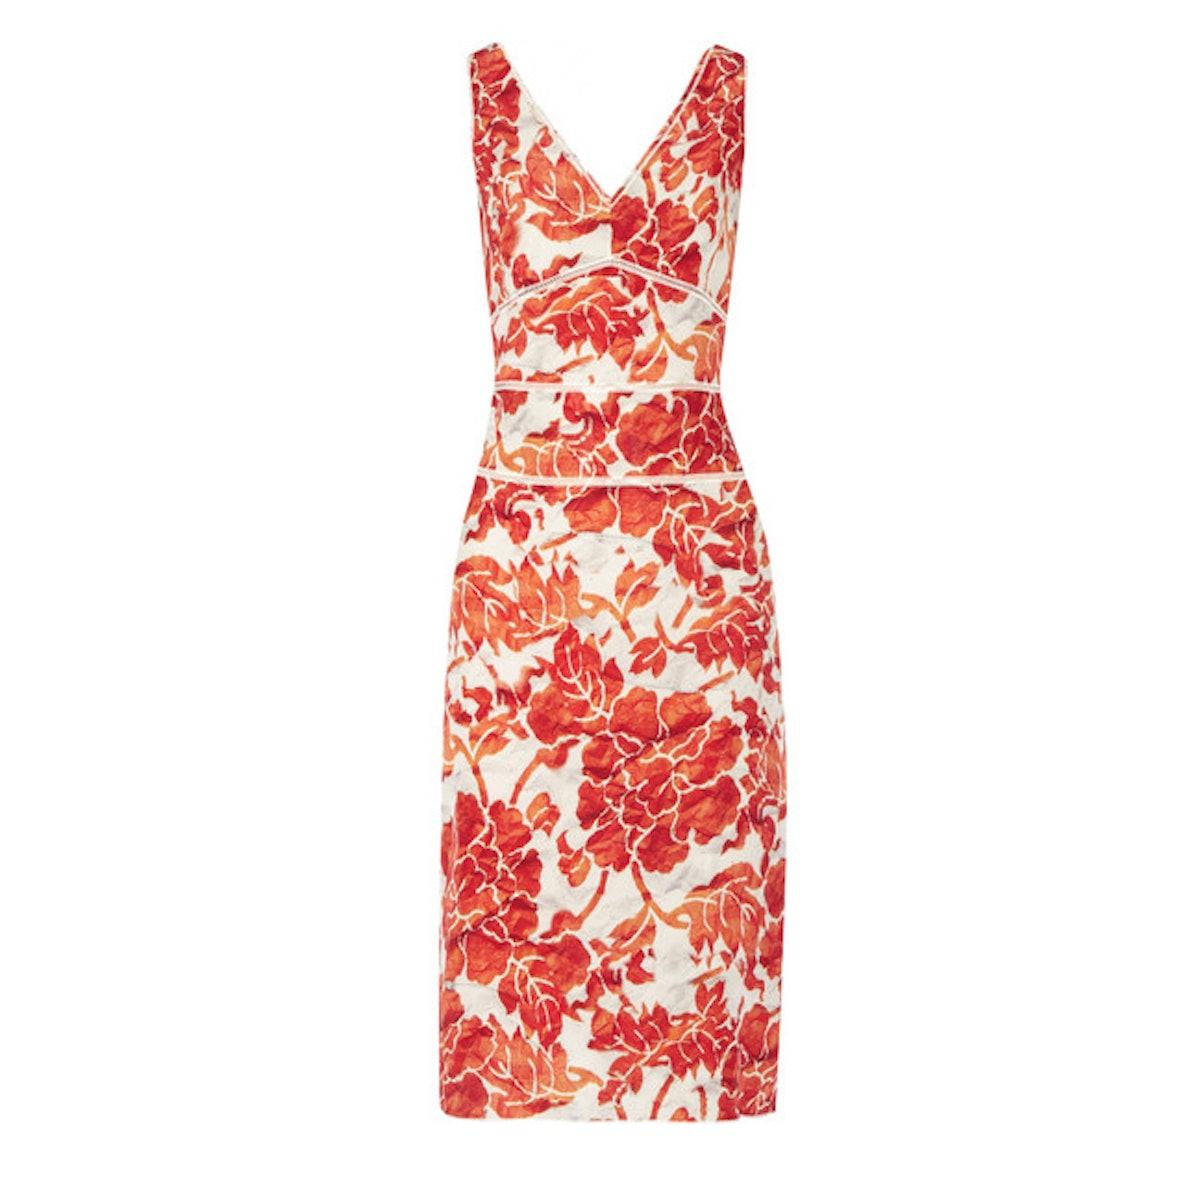 Altuzarra Gabrieli floral-print silk crepe de chine dress